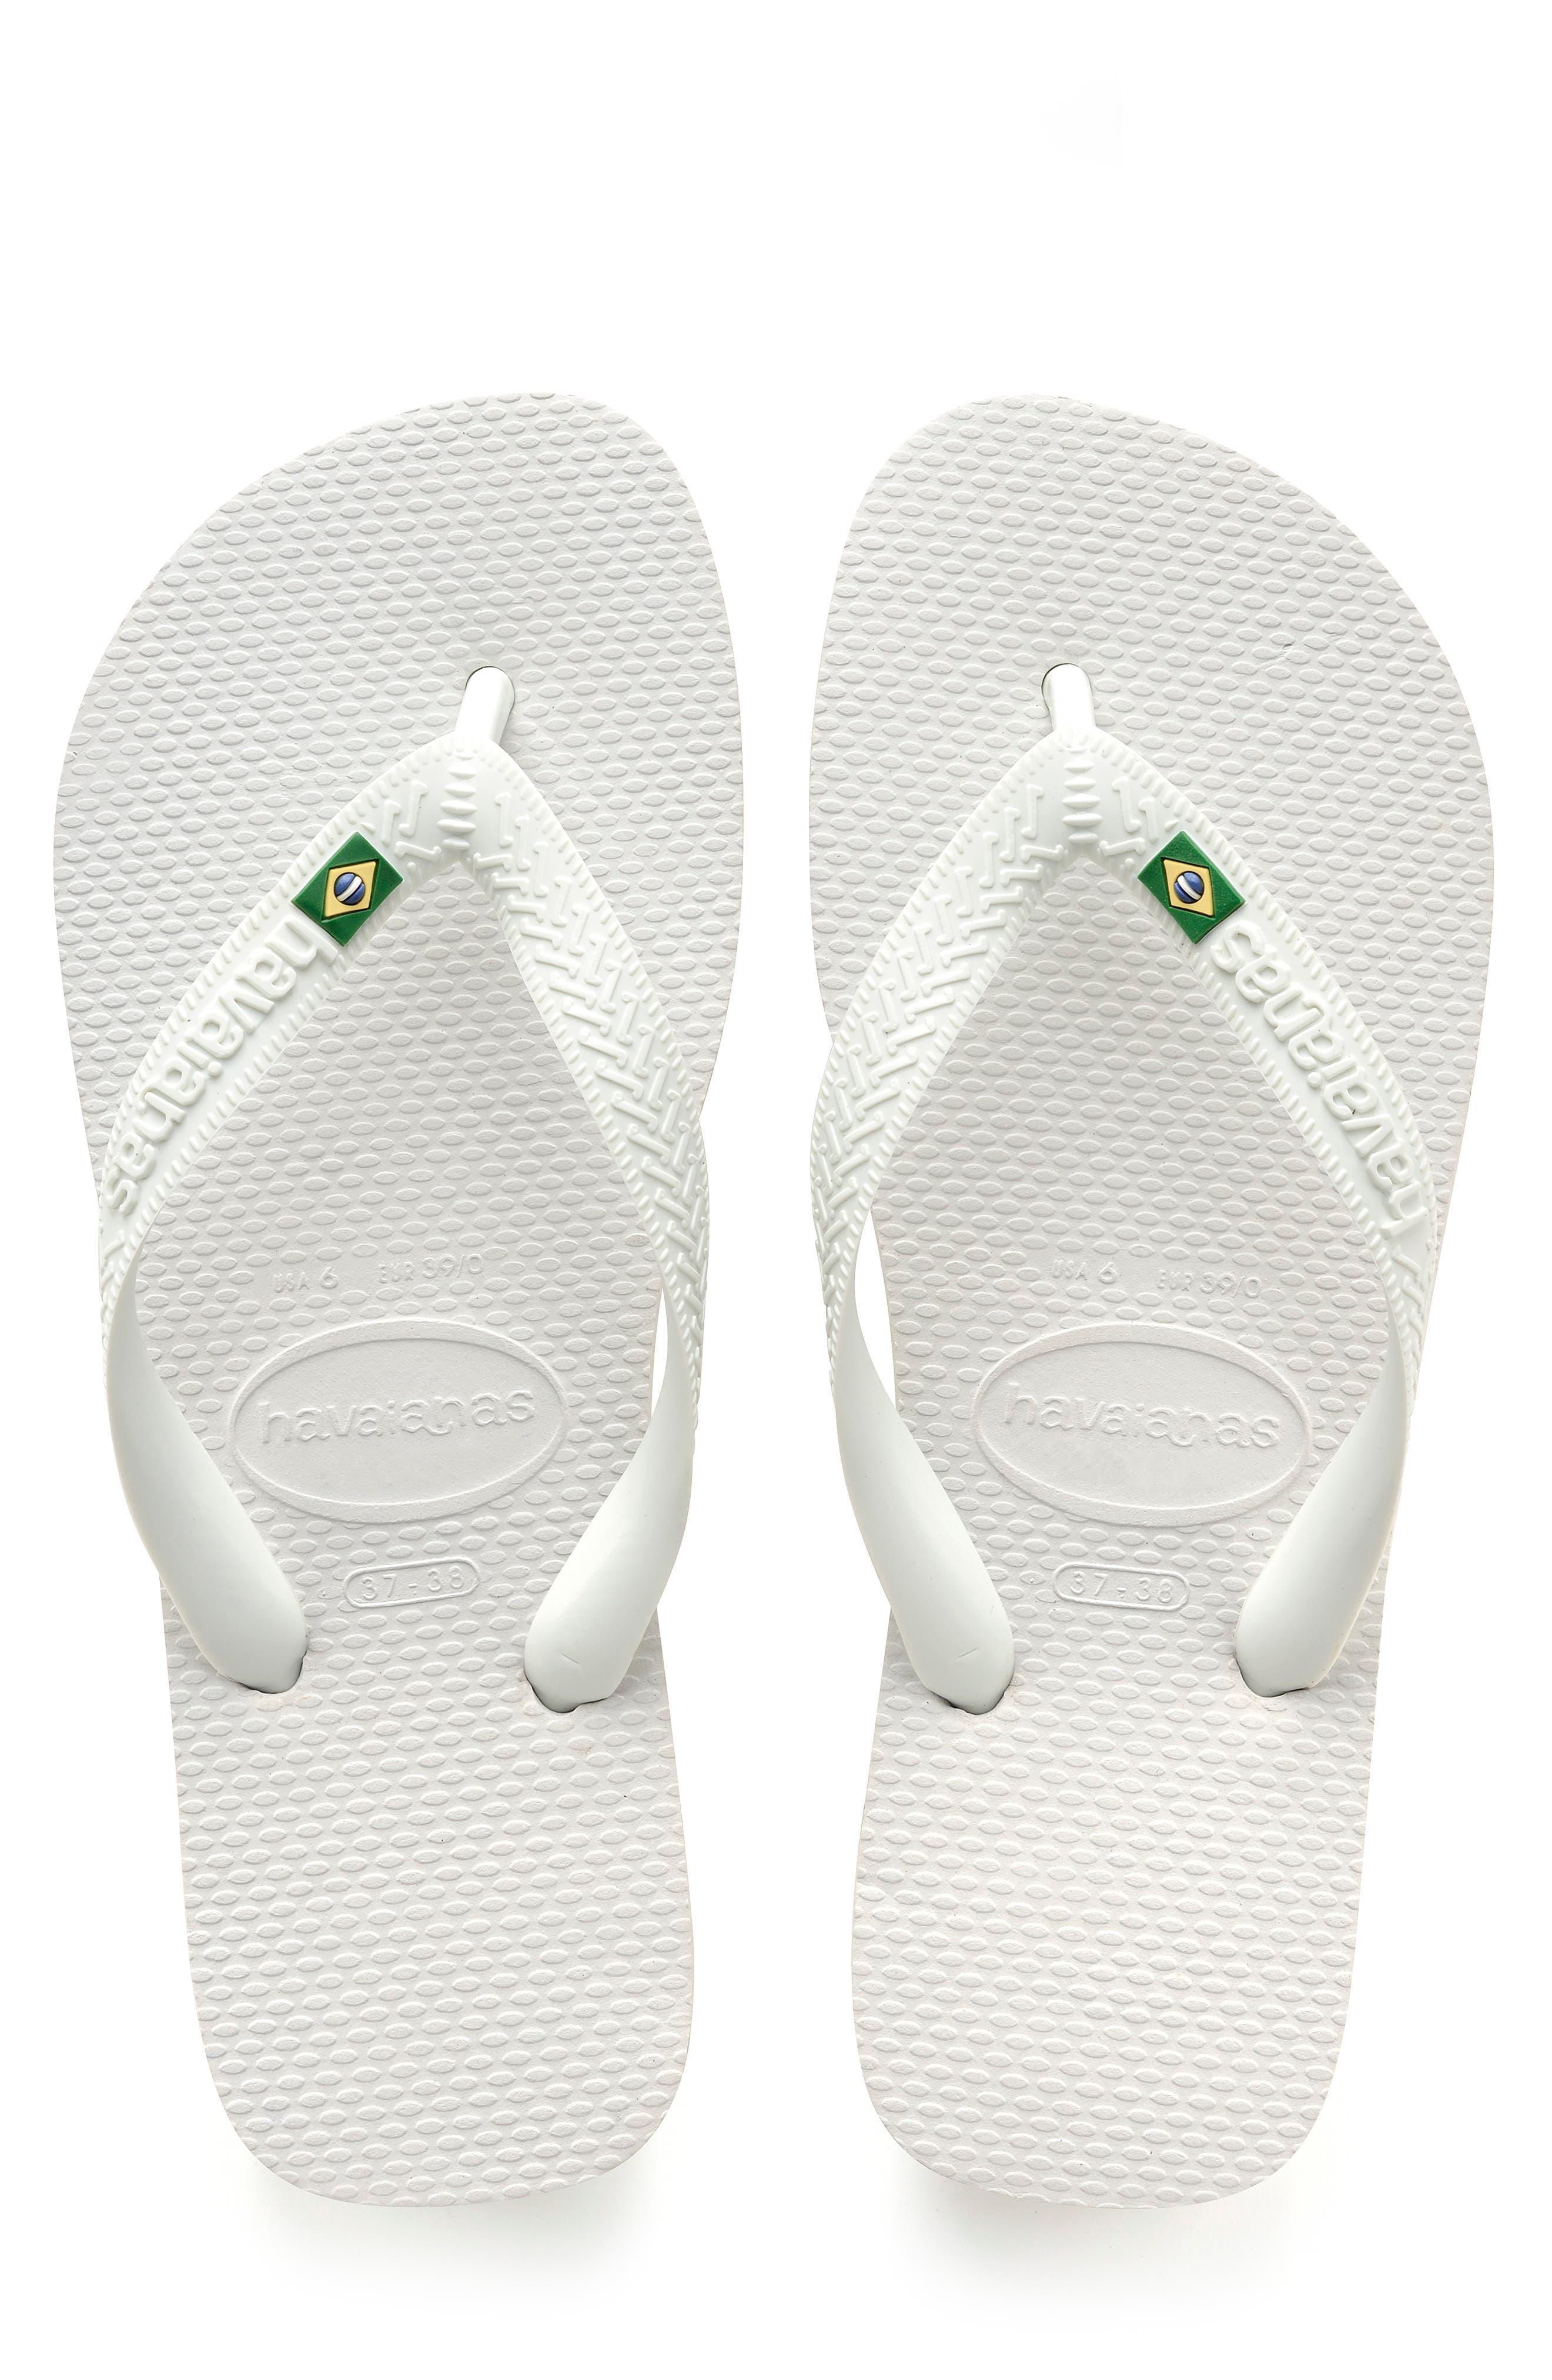 6c99d89bba6f Havaianas brazil flip flop men nordstrom jpg 1660x1783 Havaianas flip  brazil baby feet flops